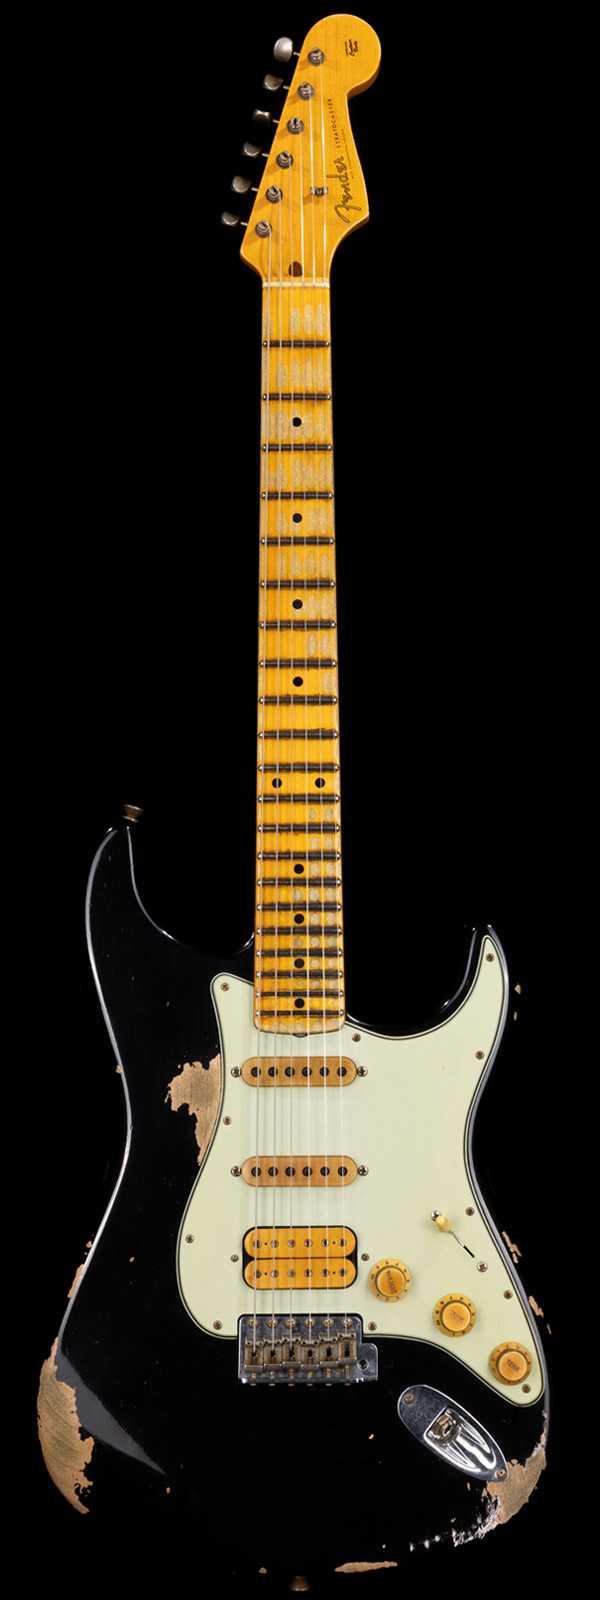 Fender Custom Shop Alley Cat Stratocaster Heavy Relic HSS Vintage Trem Black